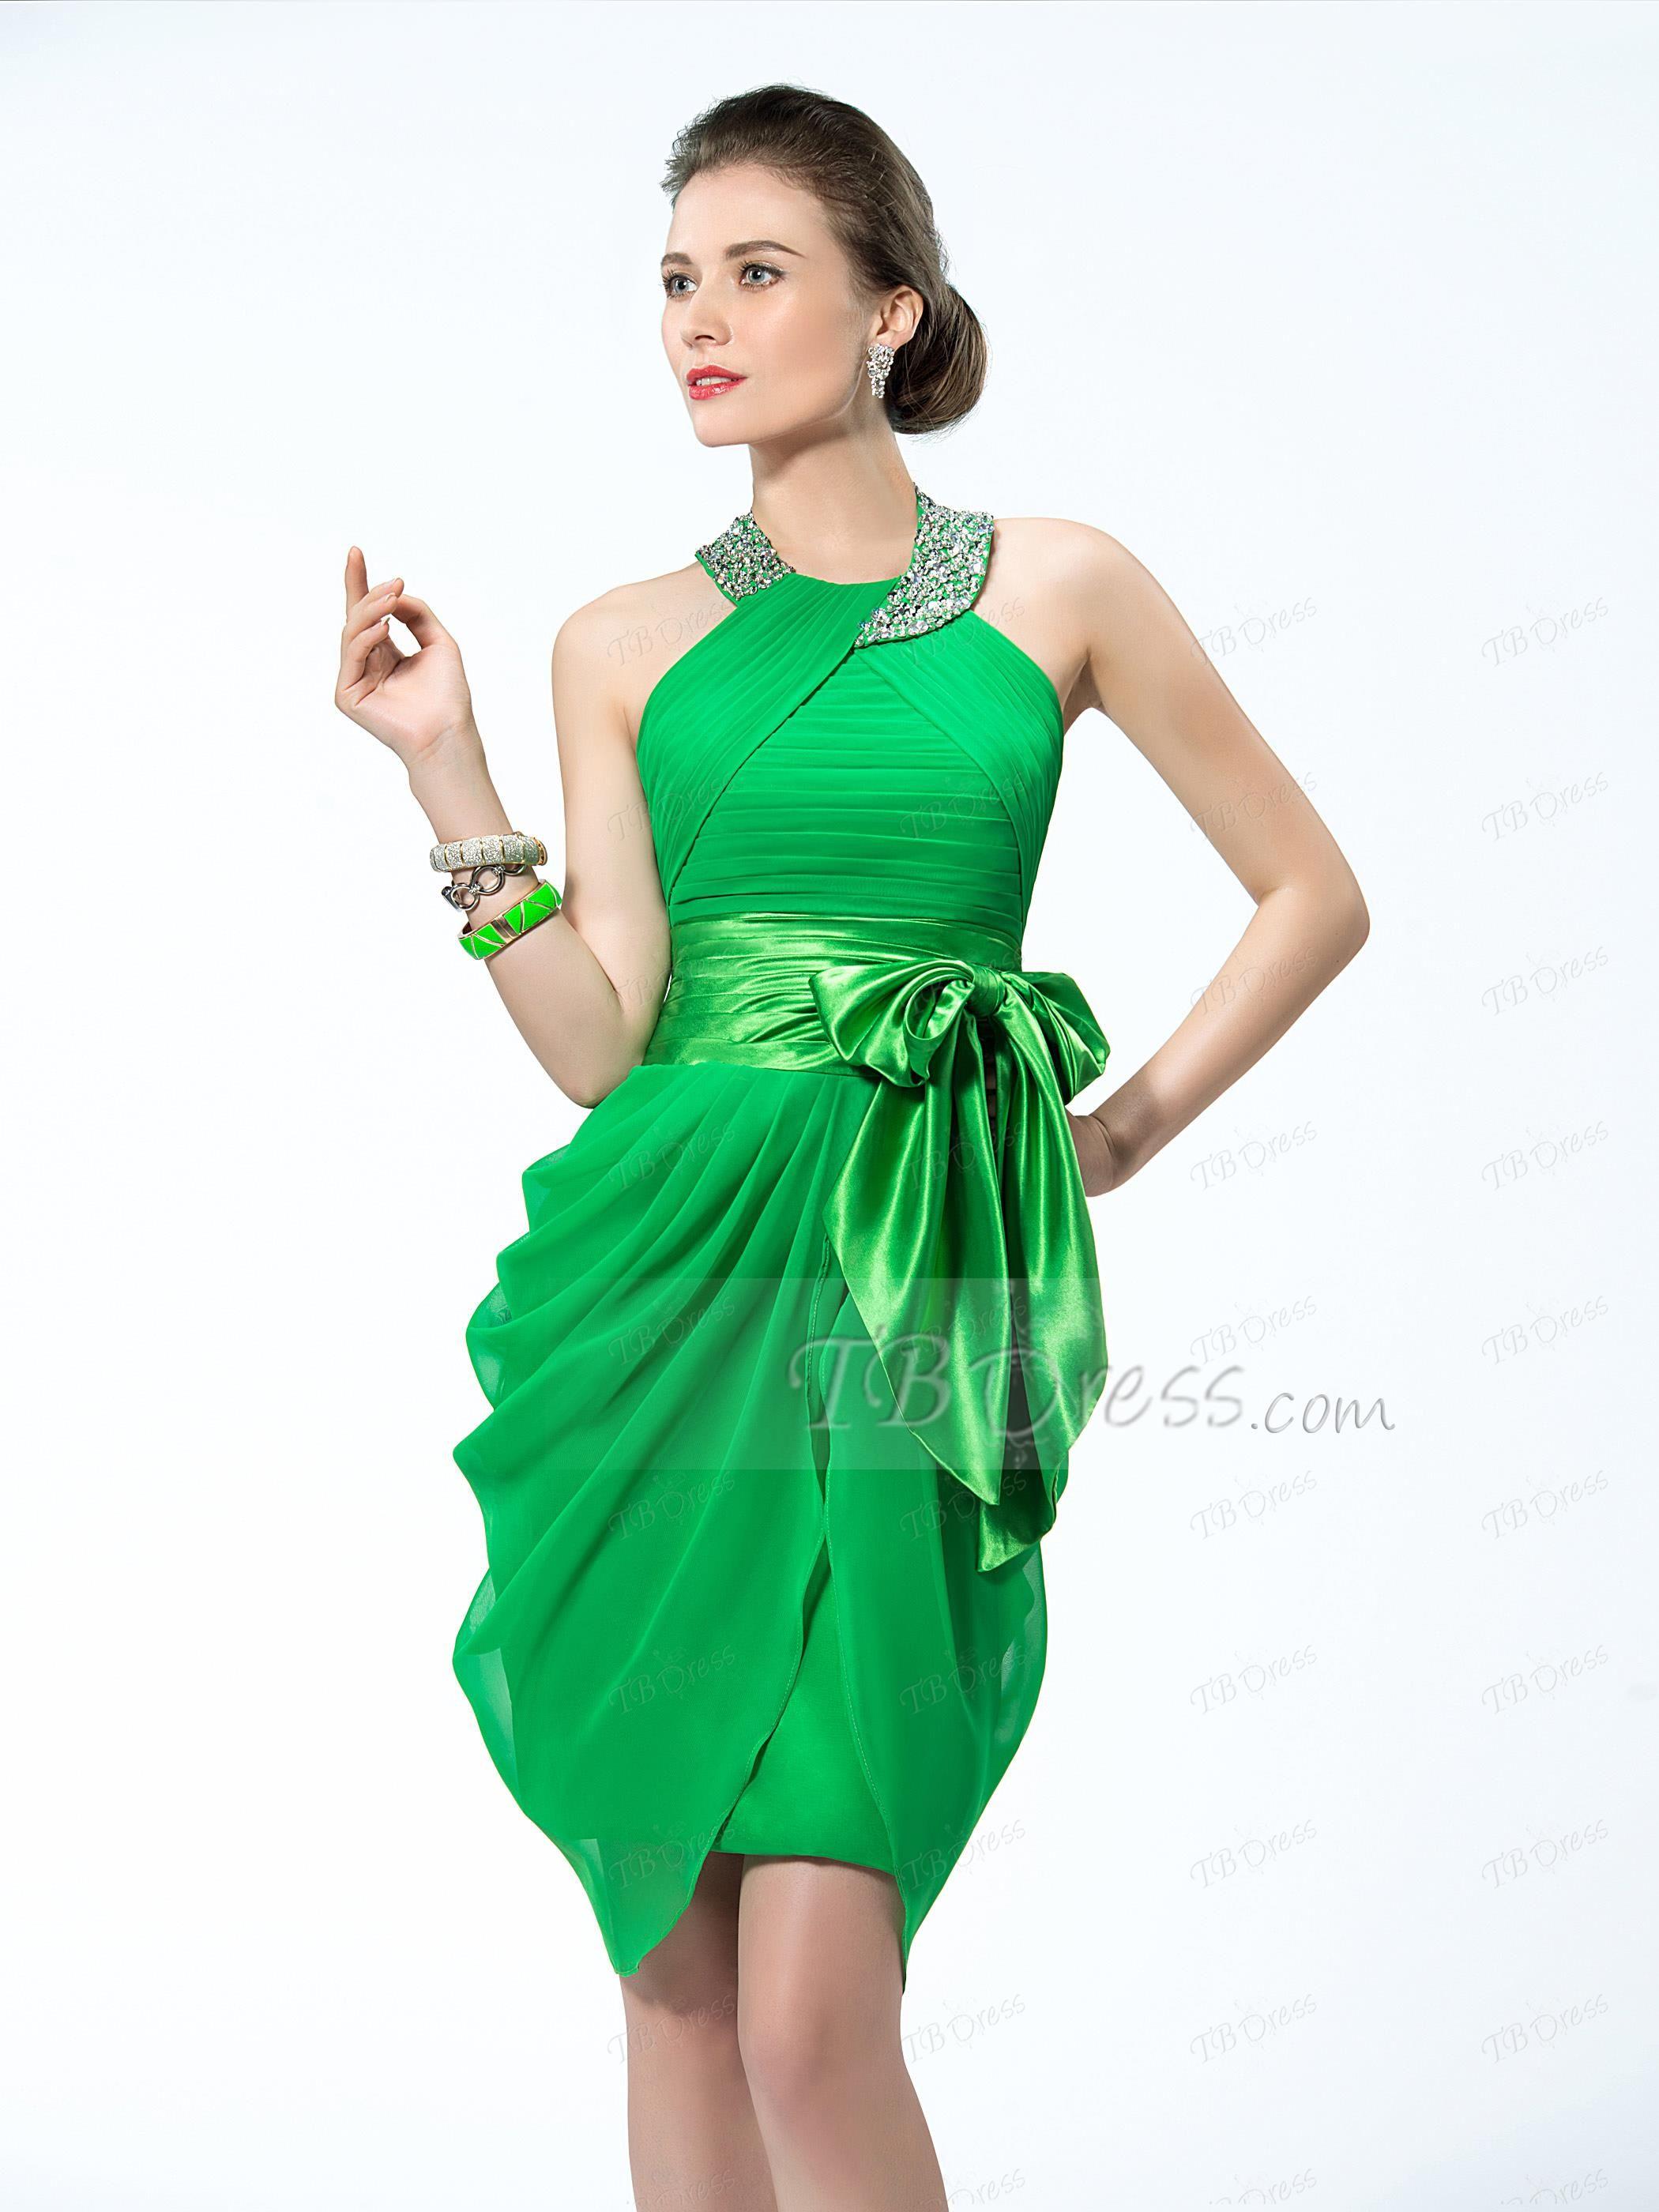 Delightful Halter Neckline Bowknot Short Cocktail Dress